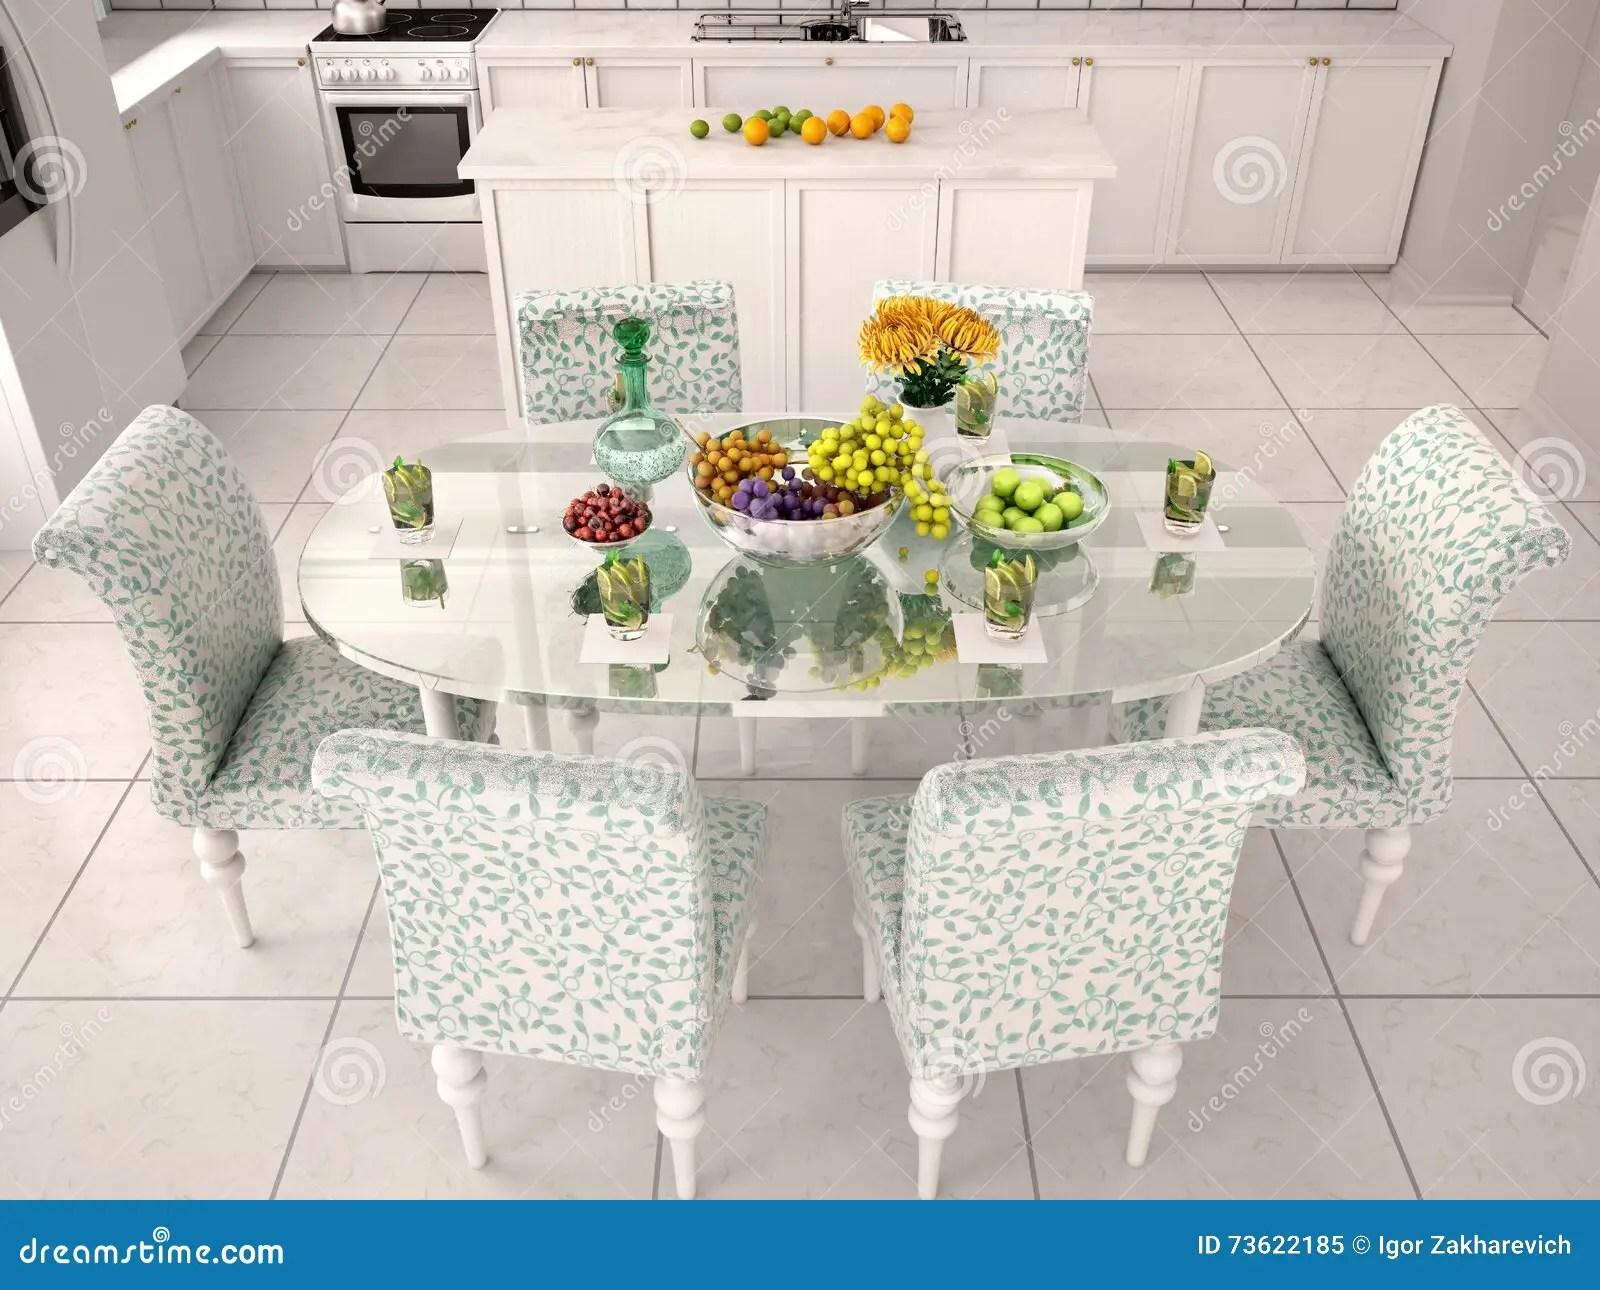 kitchen glass table drawer organization ideas 服务玻璃桌在白色厨房里库存例证 插画包括有小厨房 里面 装饰 干净 download